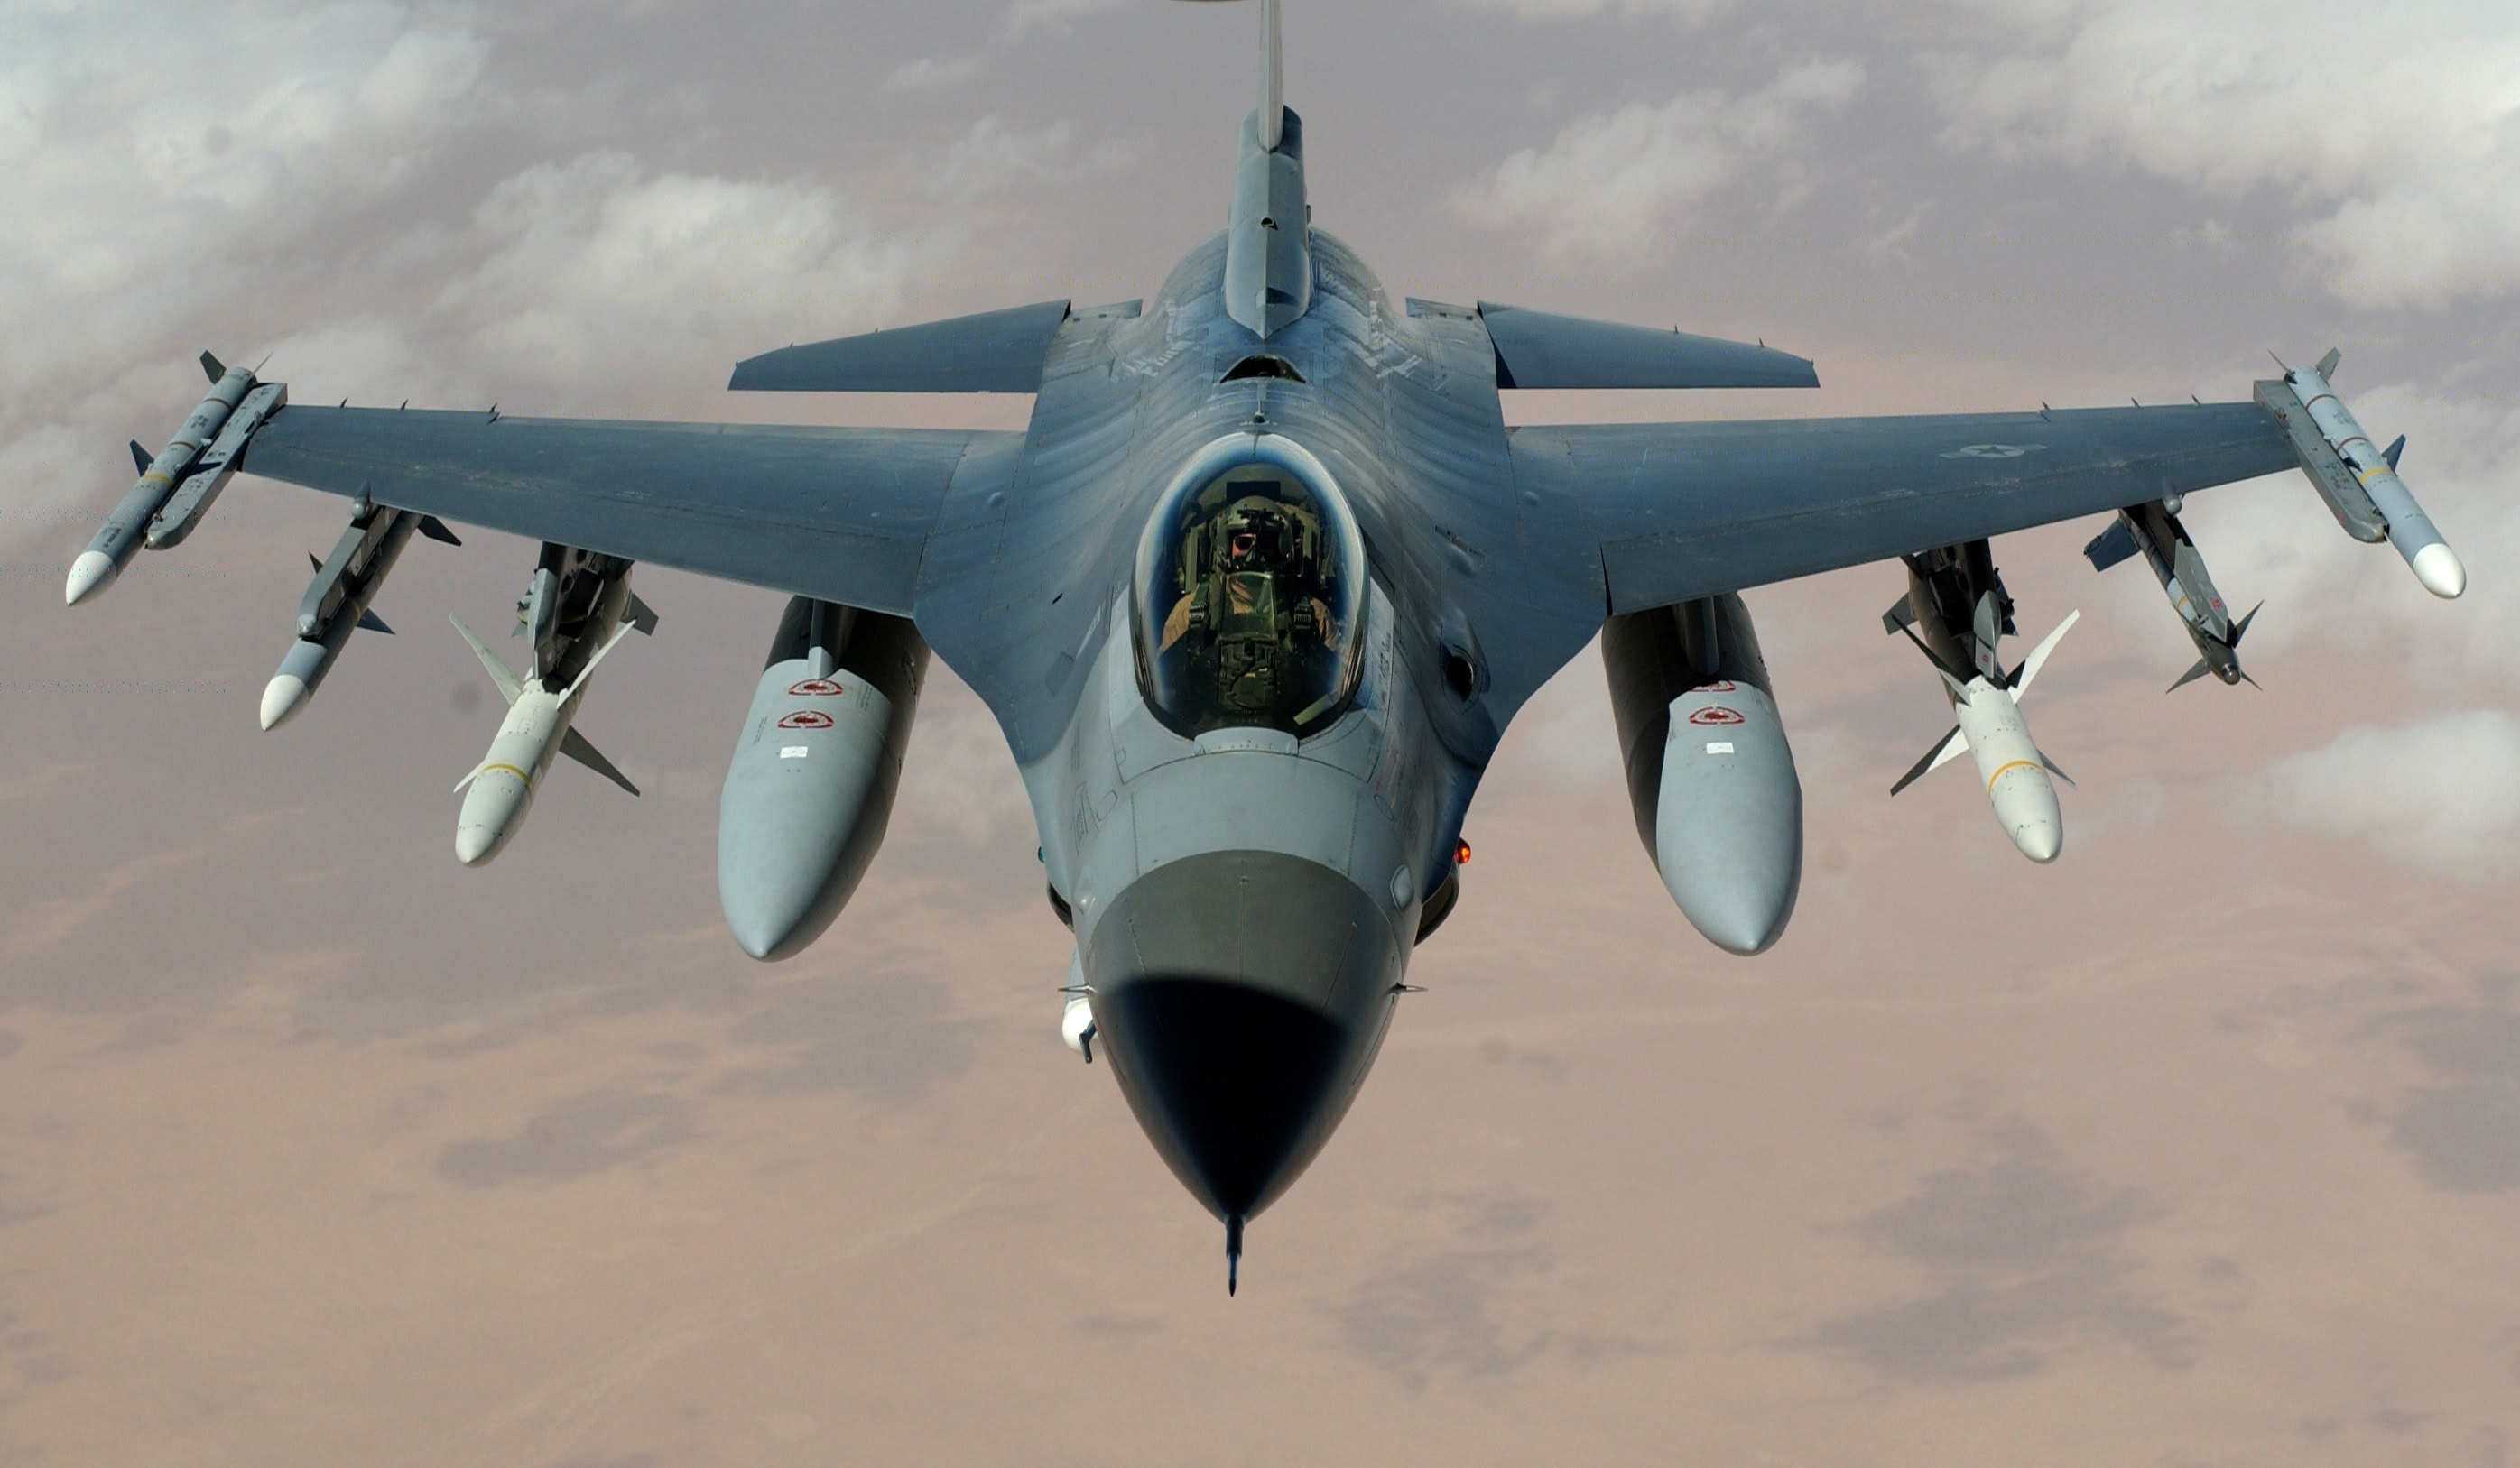 General-Dynamics-F-16-Fighting-Falcon-Wallpaper